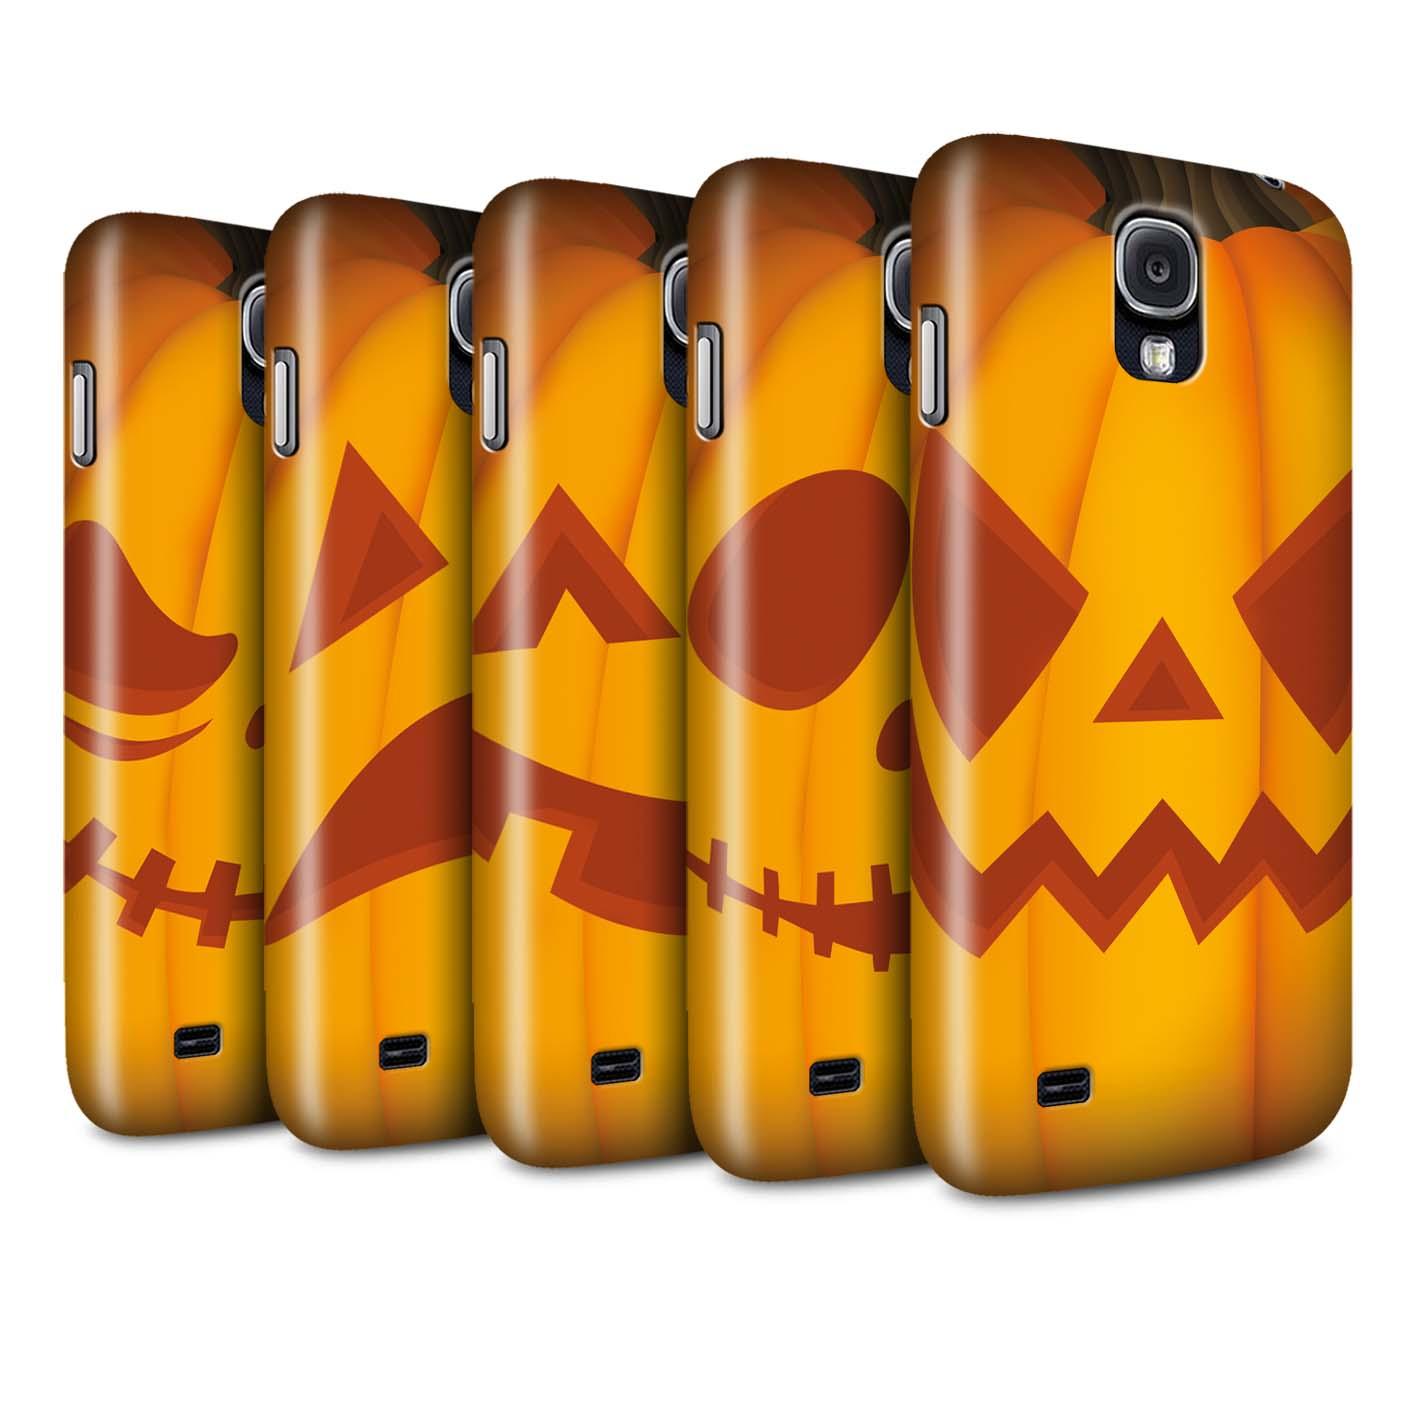 STUFF4-Matte-Phone-Case-for-Samsung-Galaxy-S4-SIV-Halloween-Pumpkin